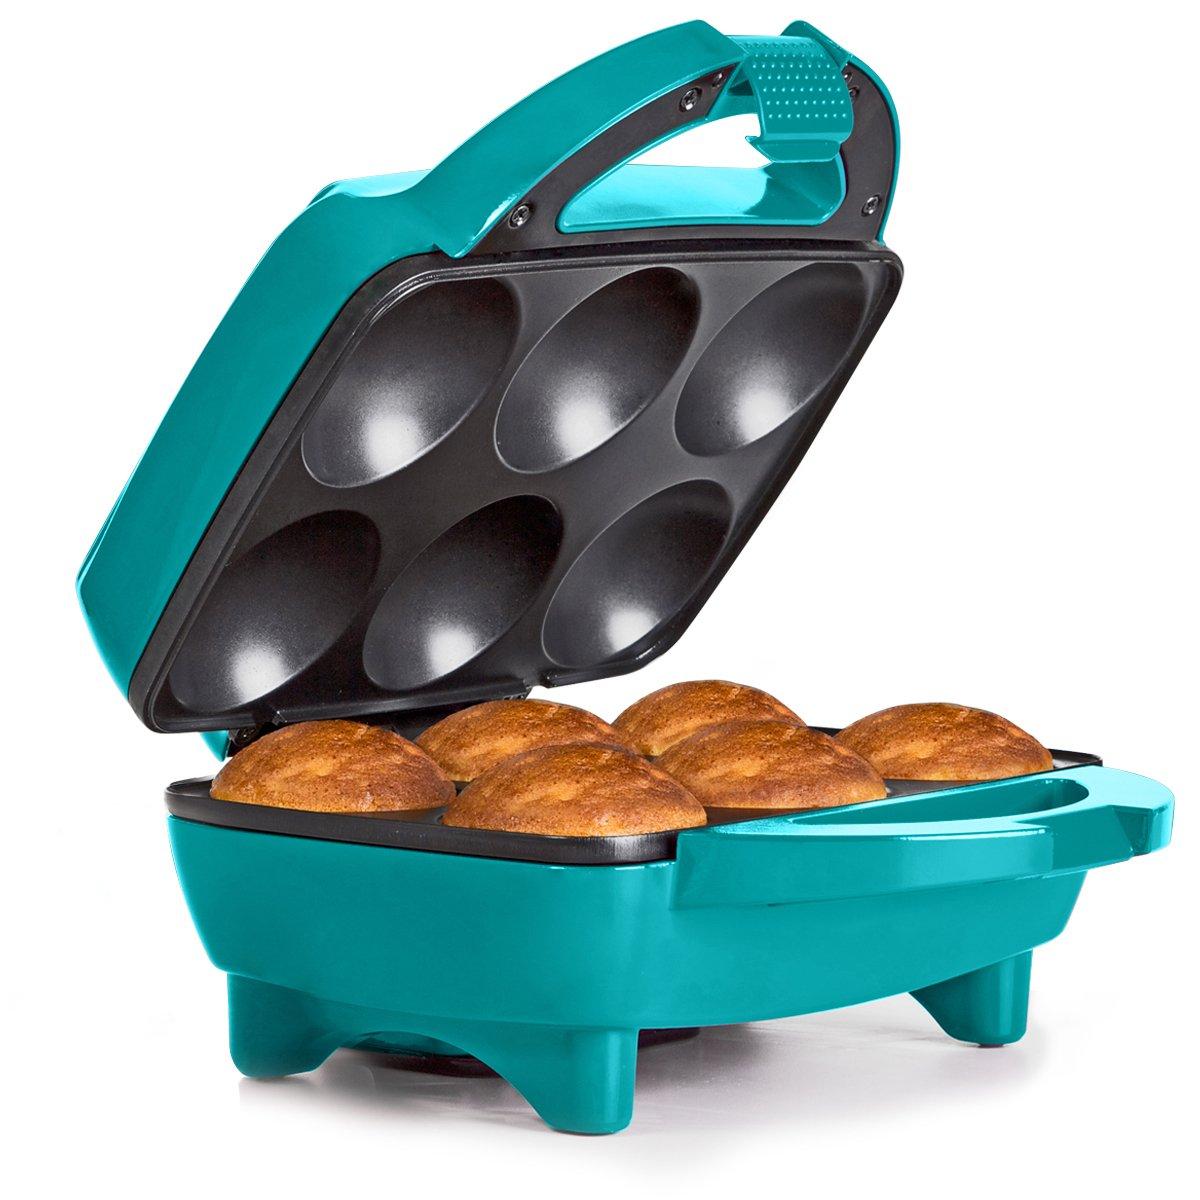 Holstein Housewares HF-09013E Fun Cupcake Maker - Teal by Holstein Housewares